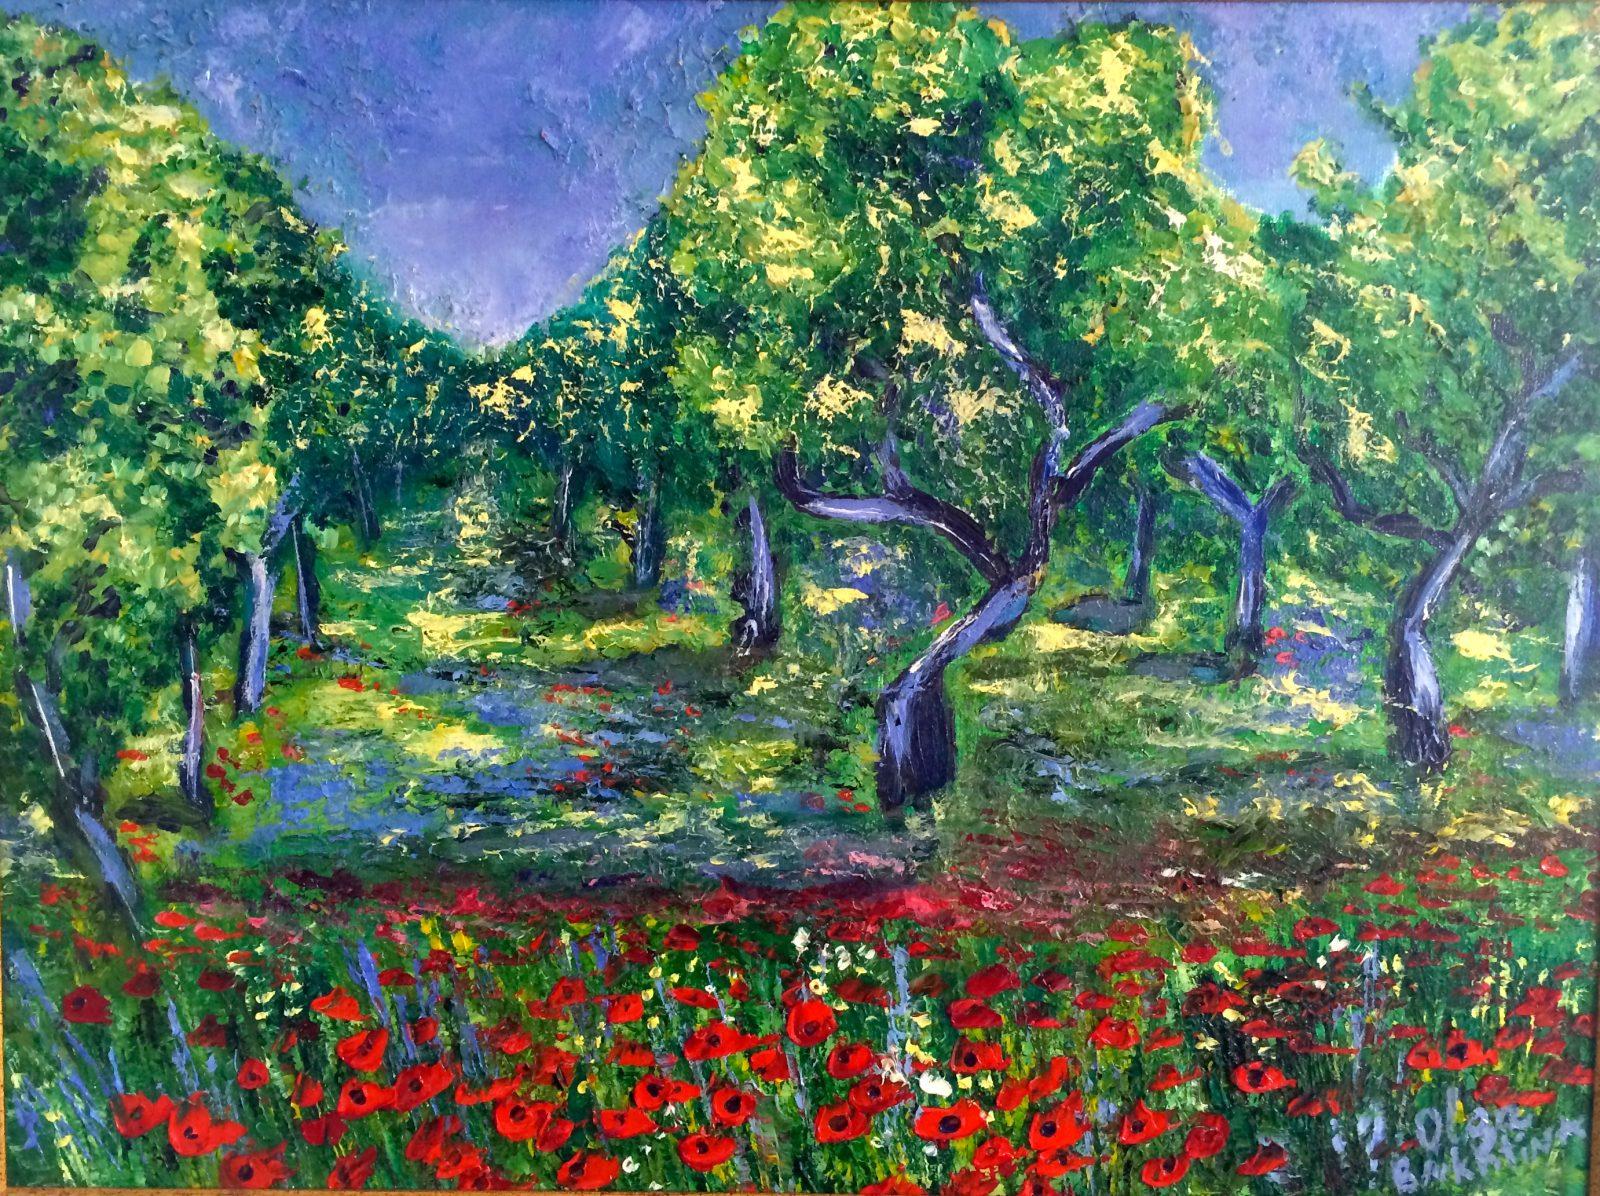 French Poppies painting | Olga Bakhtina